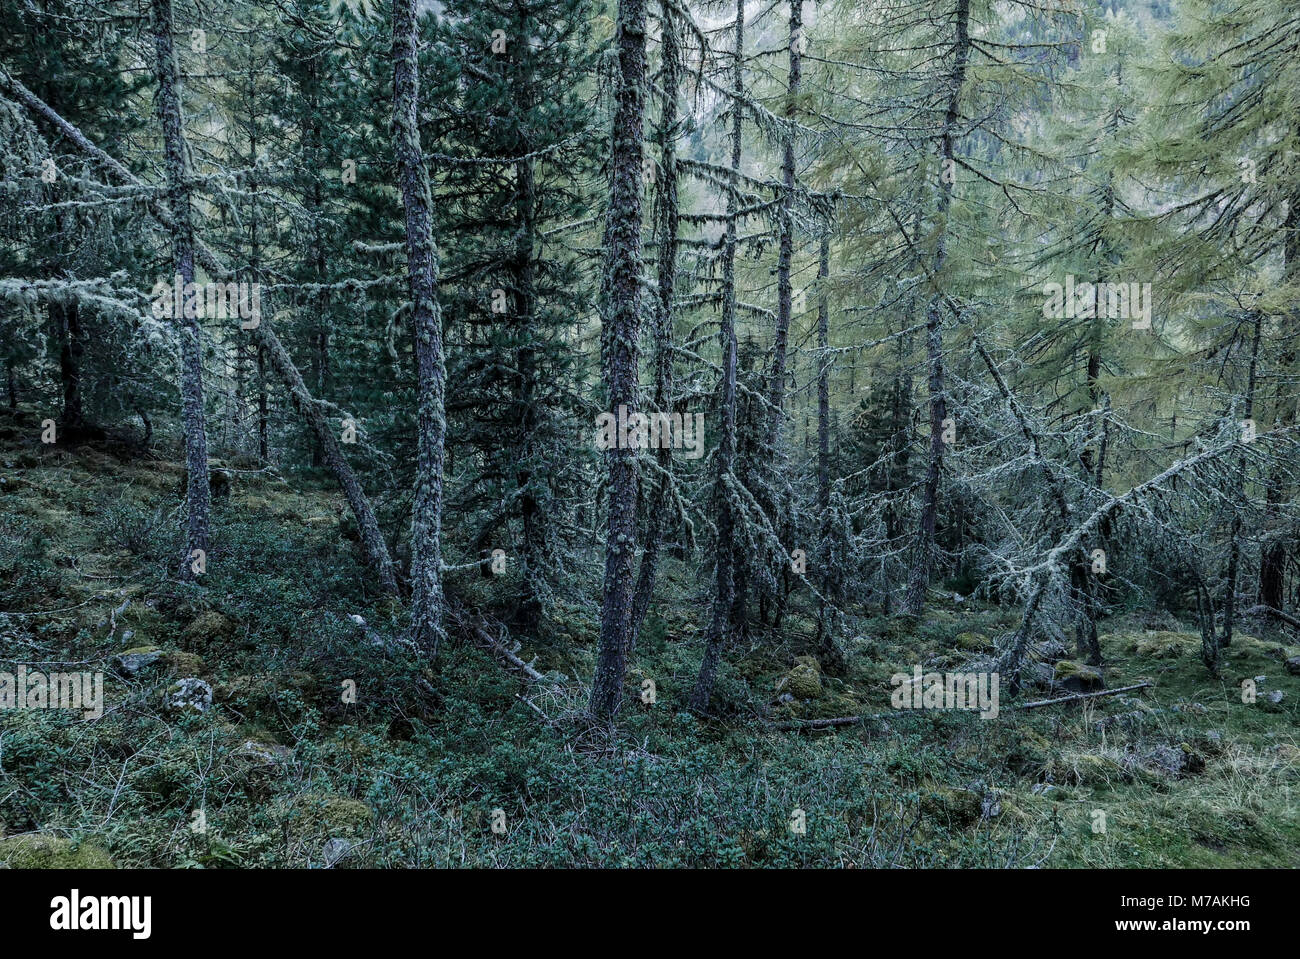 mystic forest, lichens overcast larches Stock Photo